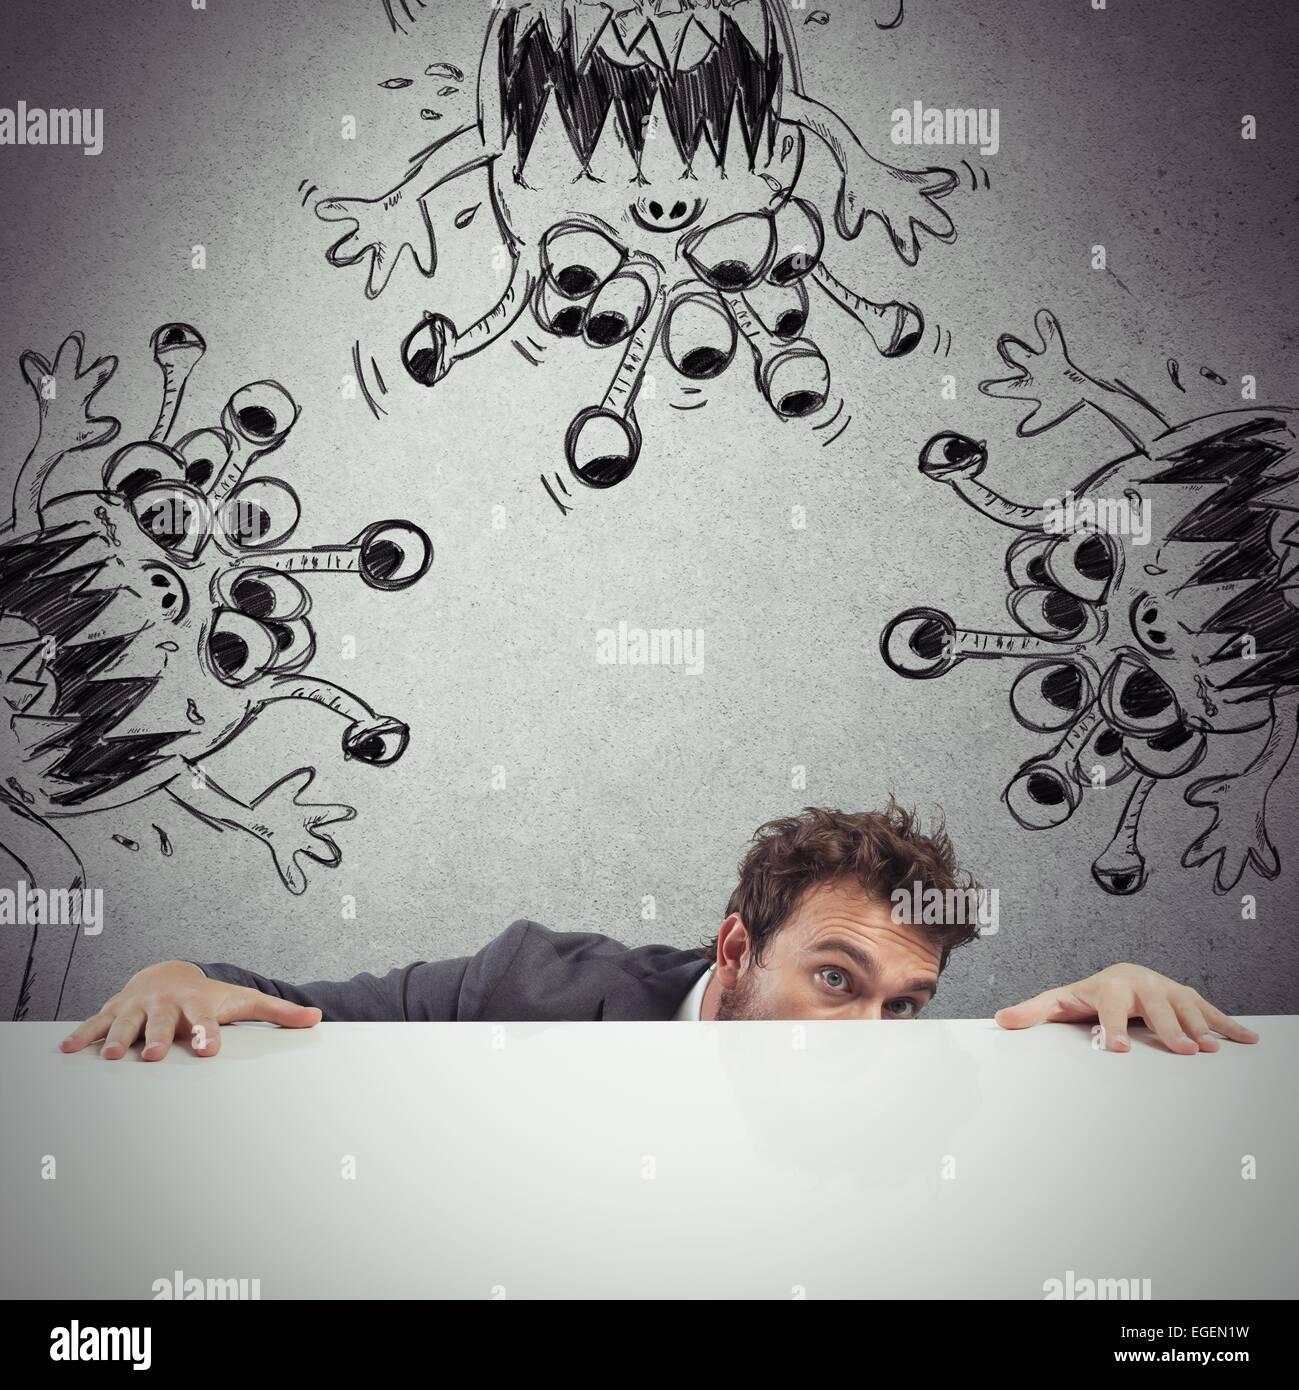 Hombre esconde virus Imagen De Stock